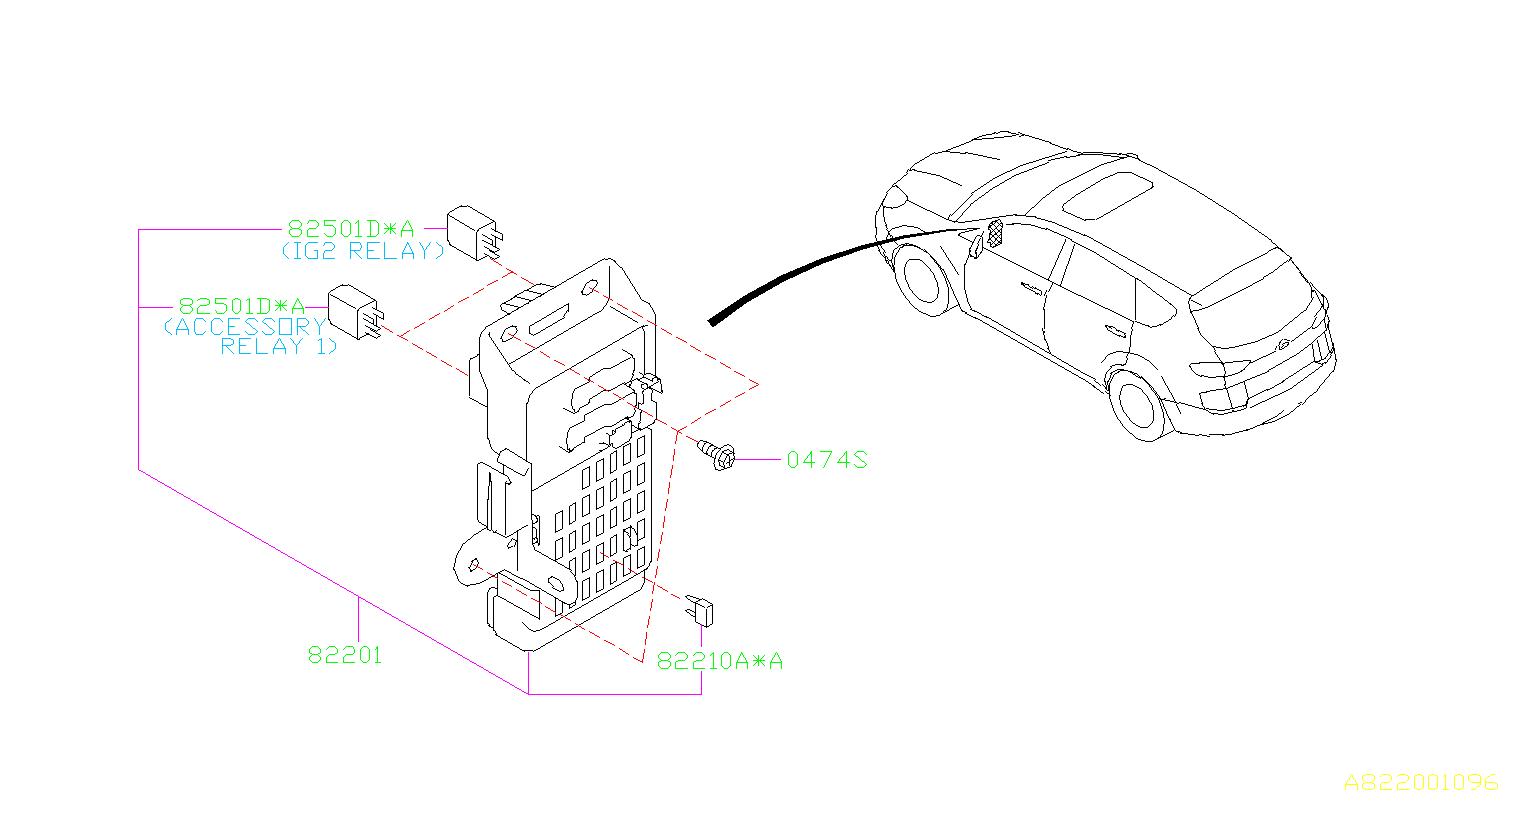 Subaru Tribeca Accessory Power Relay